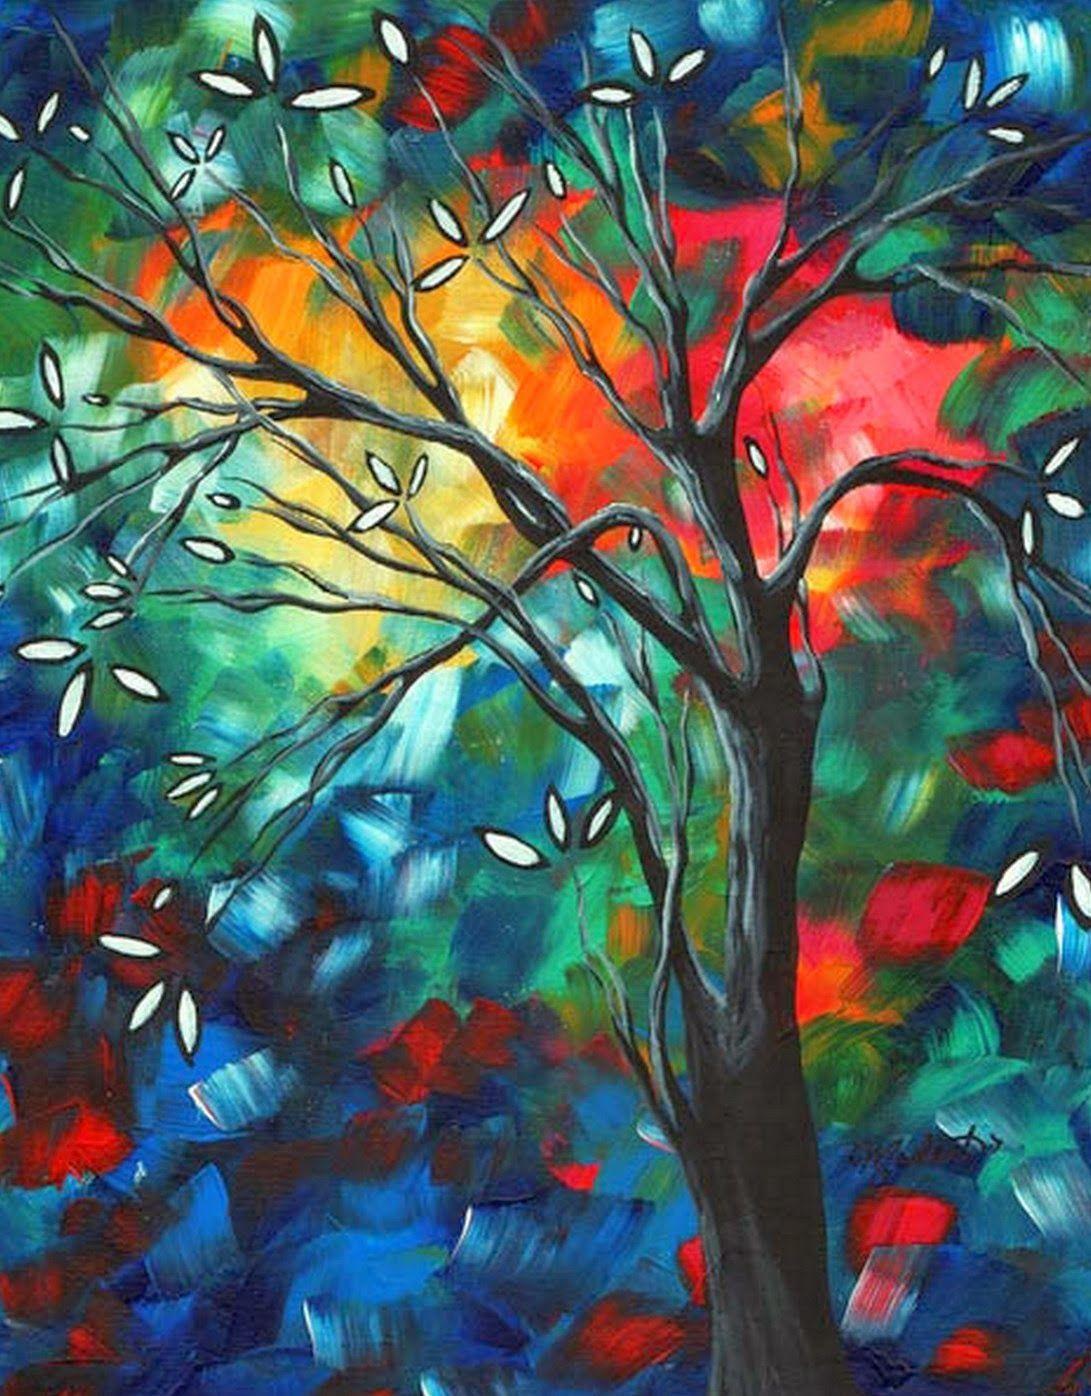 Arte abstracto pintura paisajes pintura minimalista - Fotos cuadros modernos ...